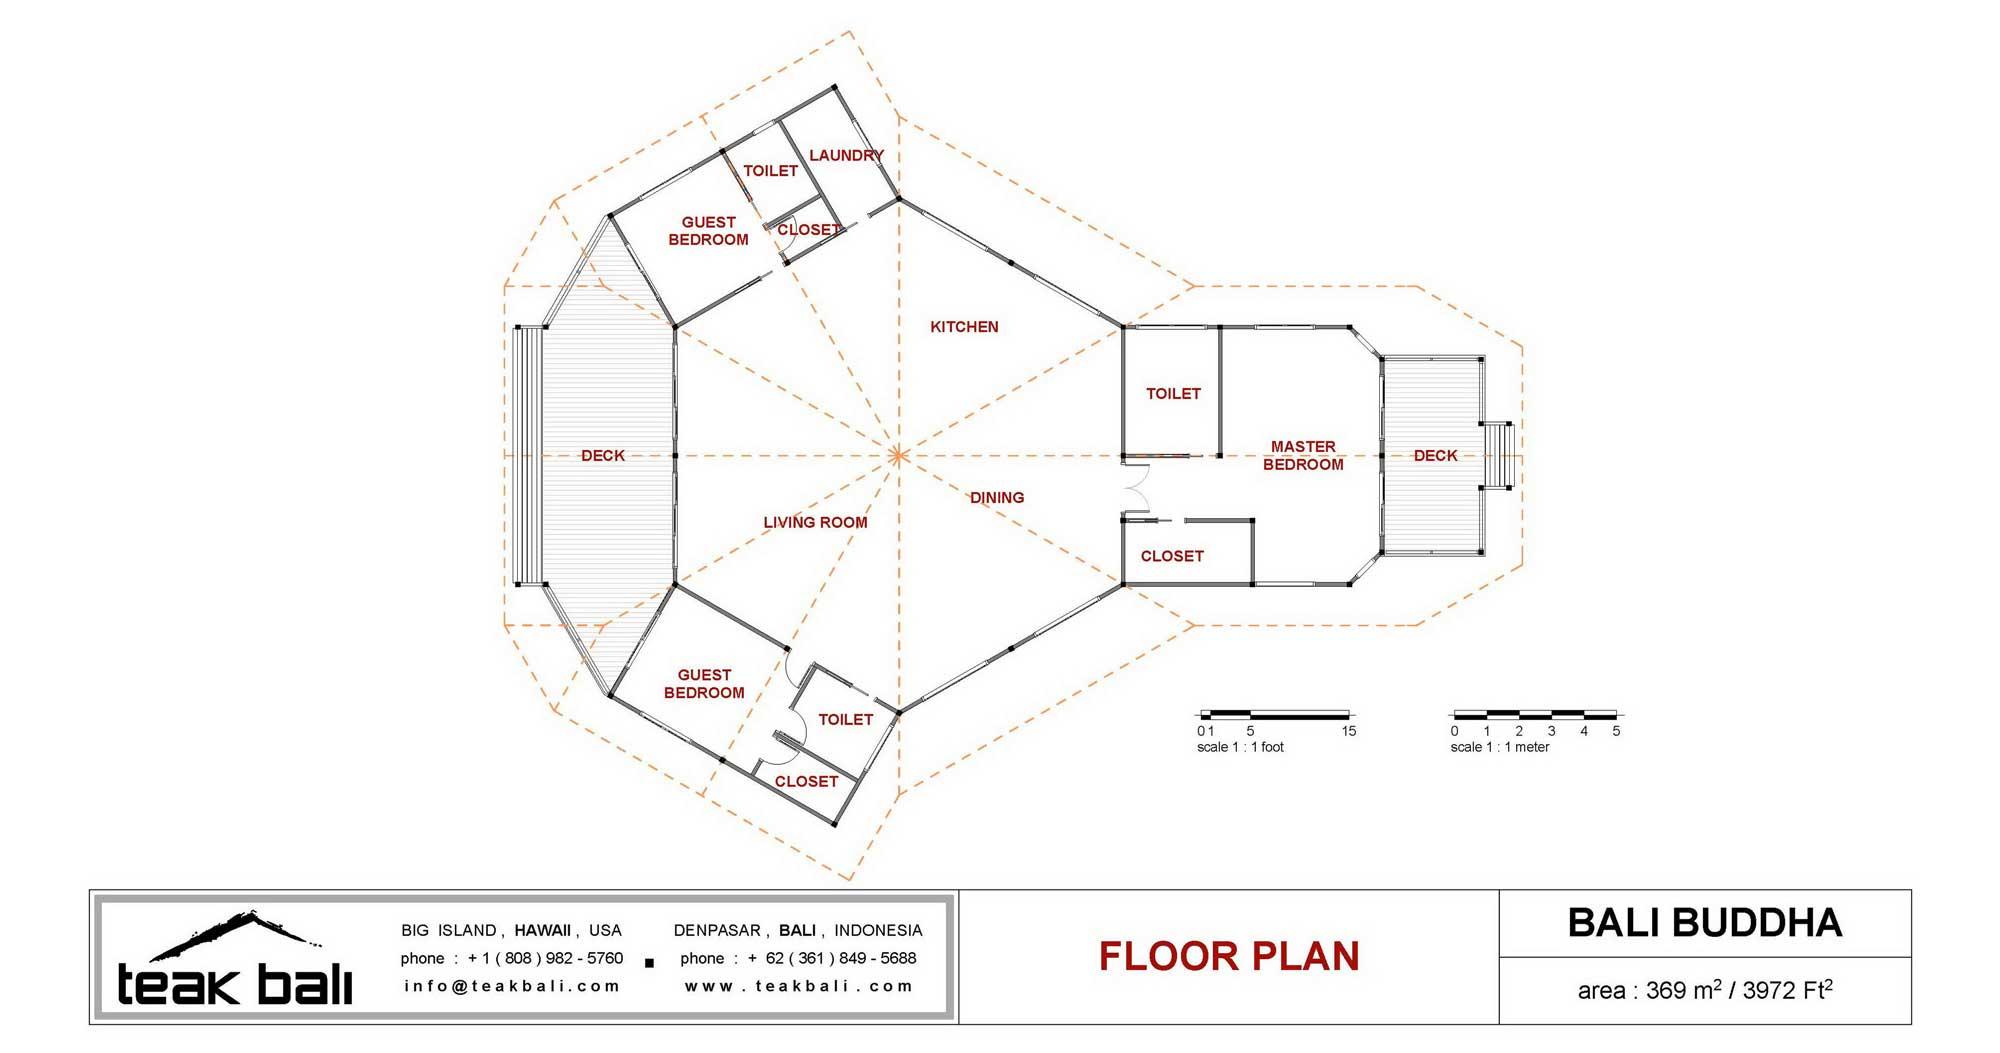 Bali Buddha Design Luxury Floor Plans Teak Bali